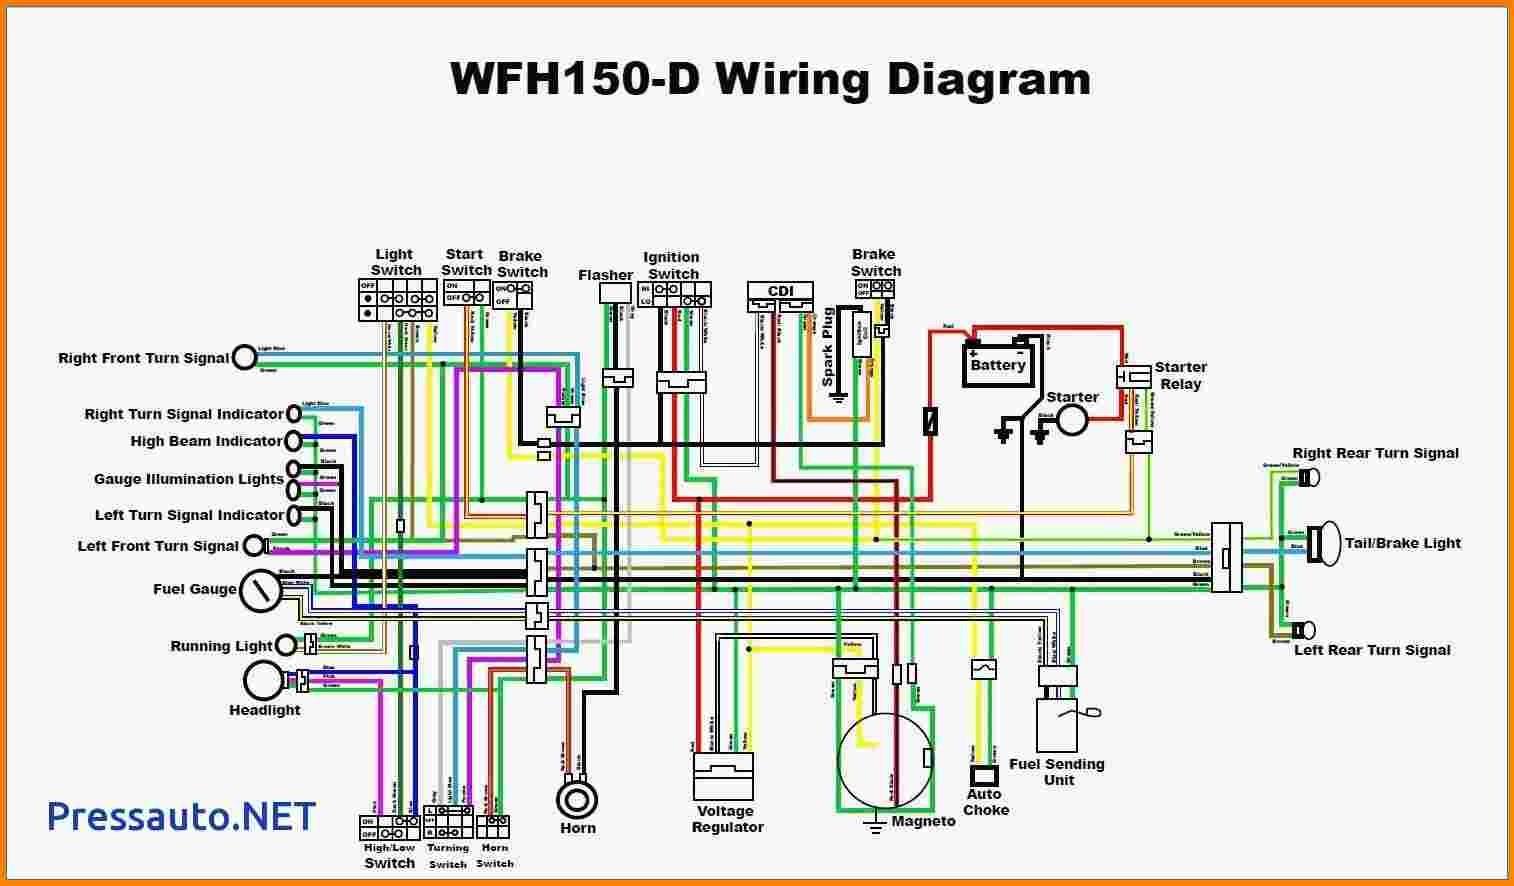 redcat wiring diagram redcat atv wiring diagram for wiring diagram data  redcat atv wiring diagram for wiring